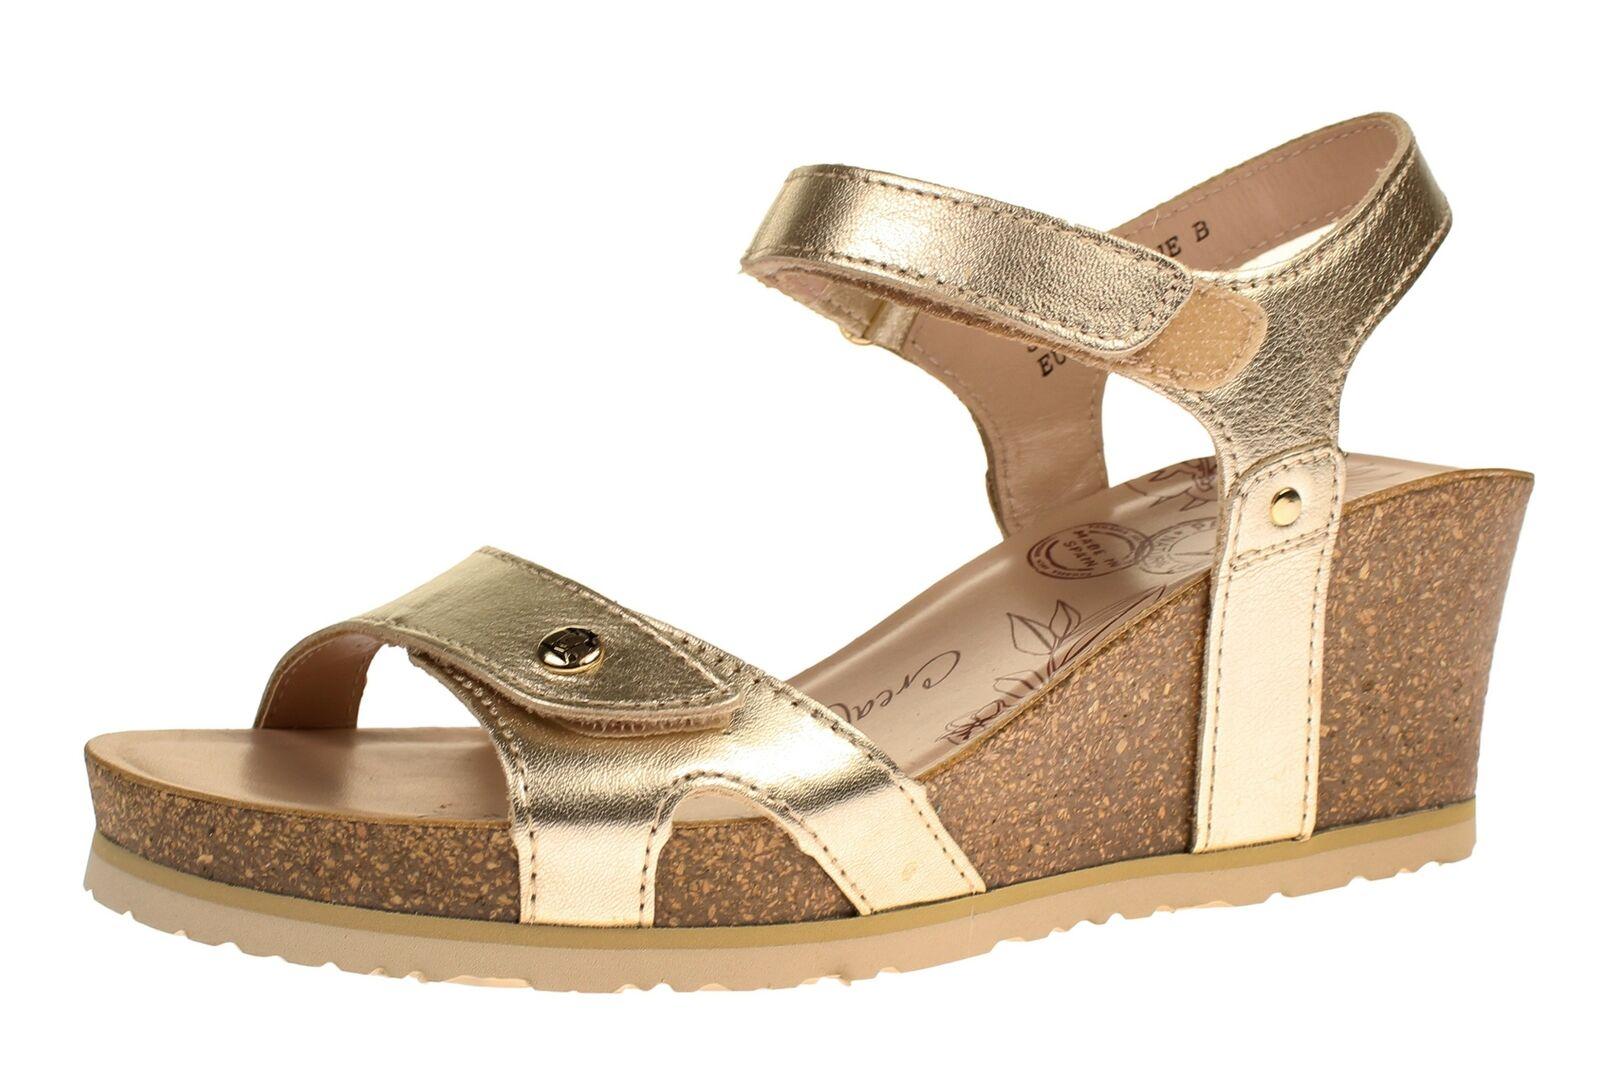 Panama Jack JULIA SHINE B3 NAPA - Damen Schuhe Sandaletten - Gold